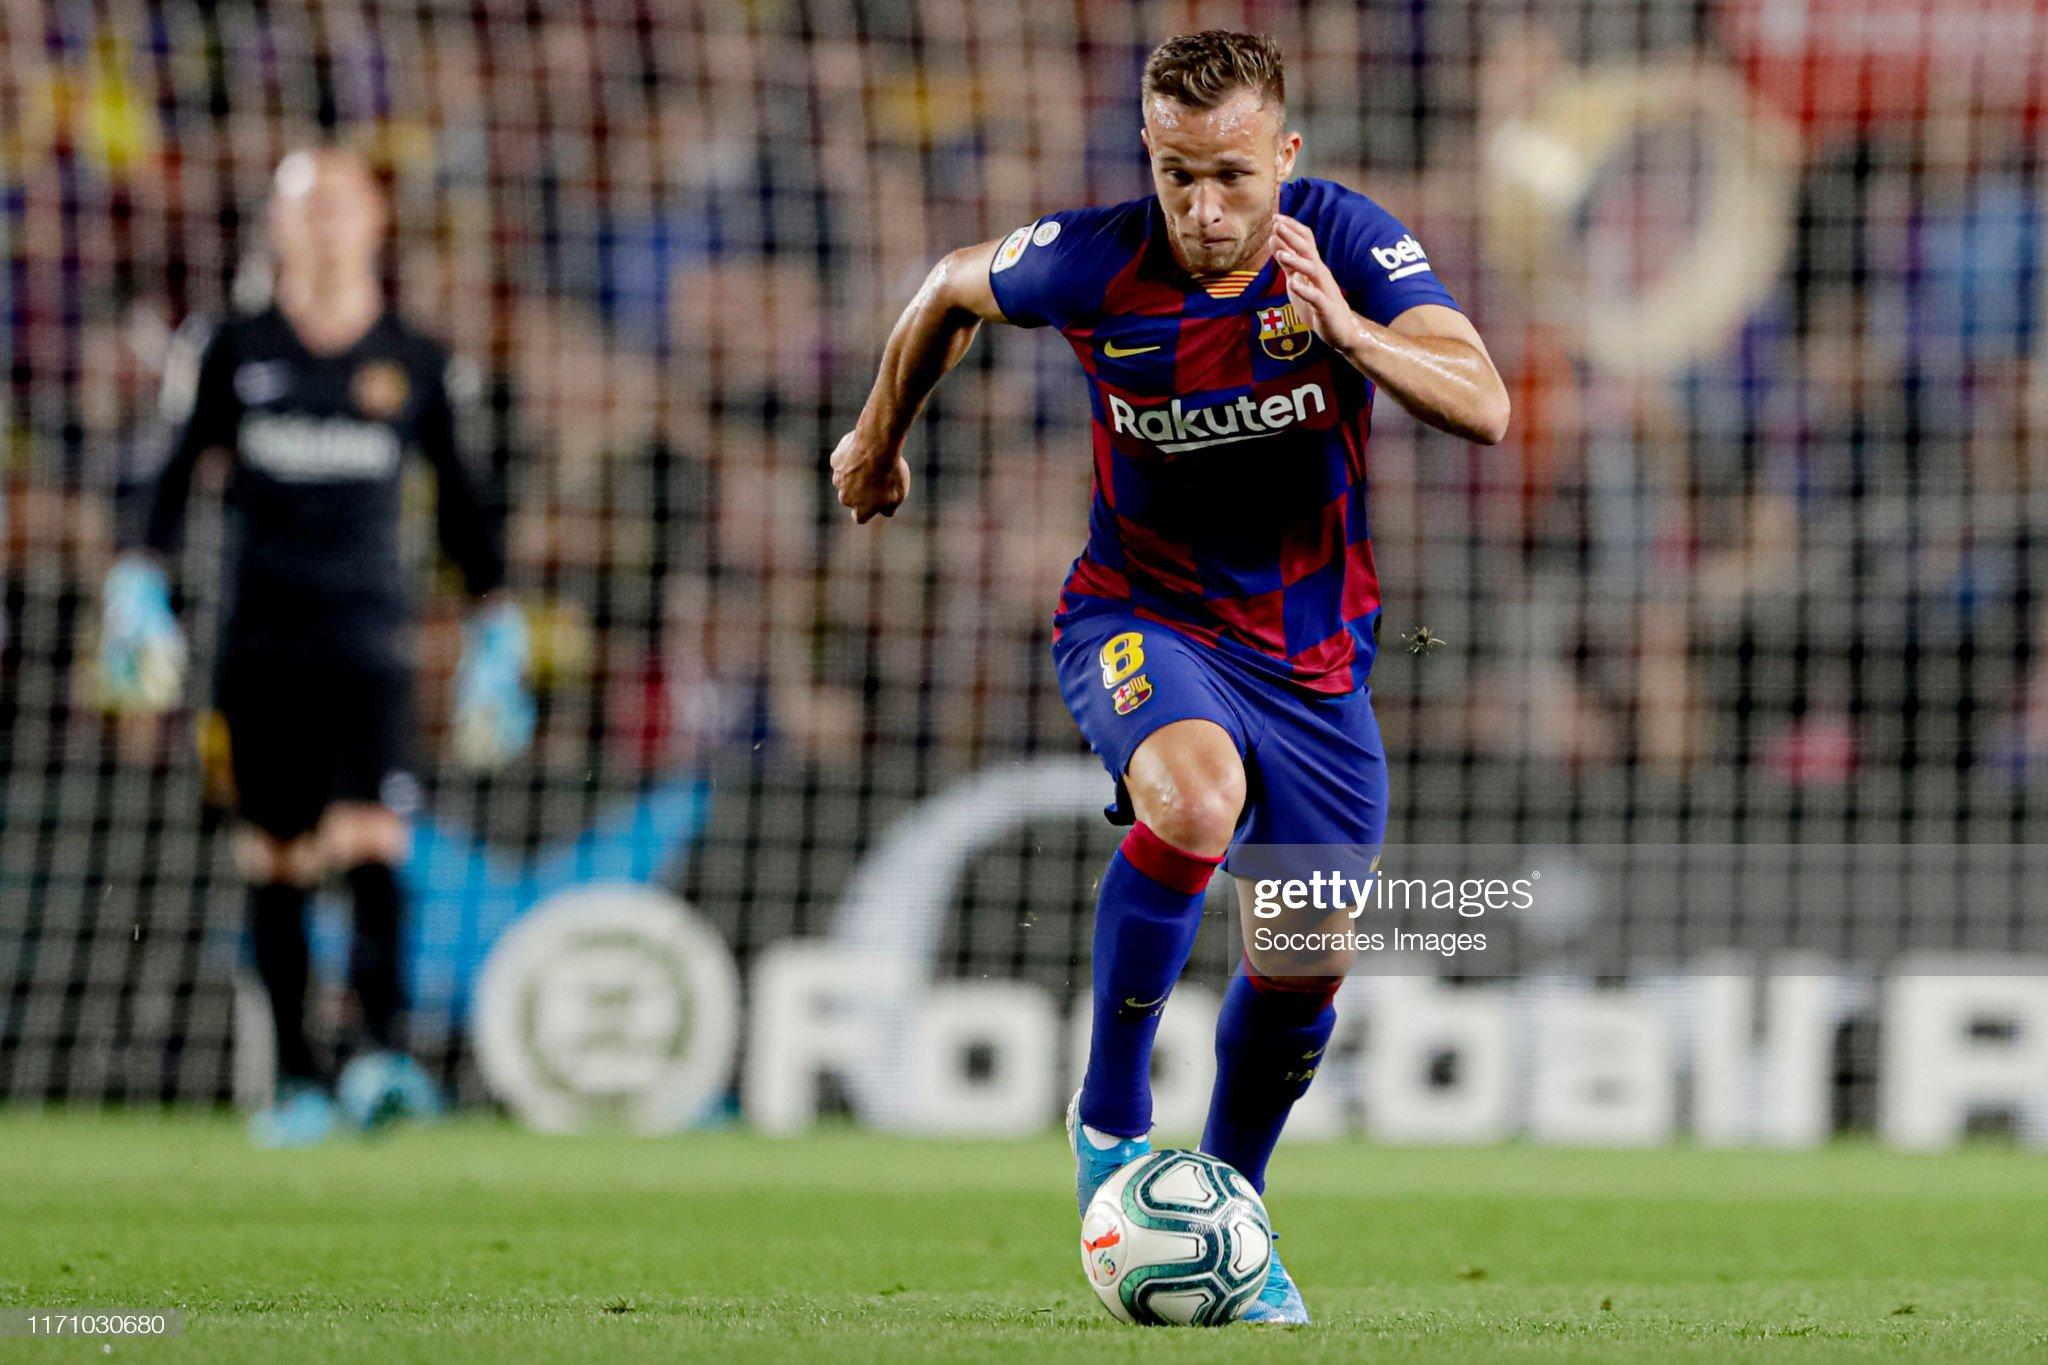 صور مباراة : برشلونة - فياريال 2-1 ( 24-09-2019 )  Arthur-of-fc-barcelona-during-the-la-liga-santander-match-between-fc-picture-id1171030680?s=2048x2048